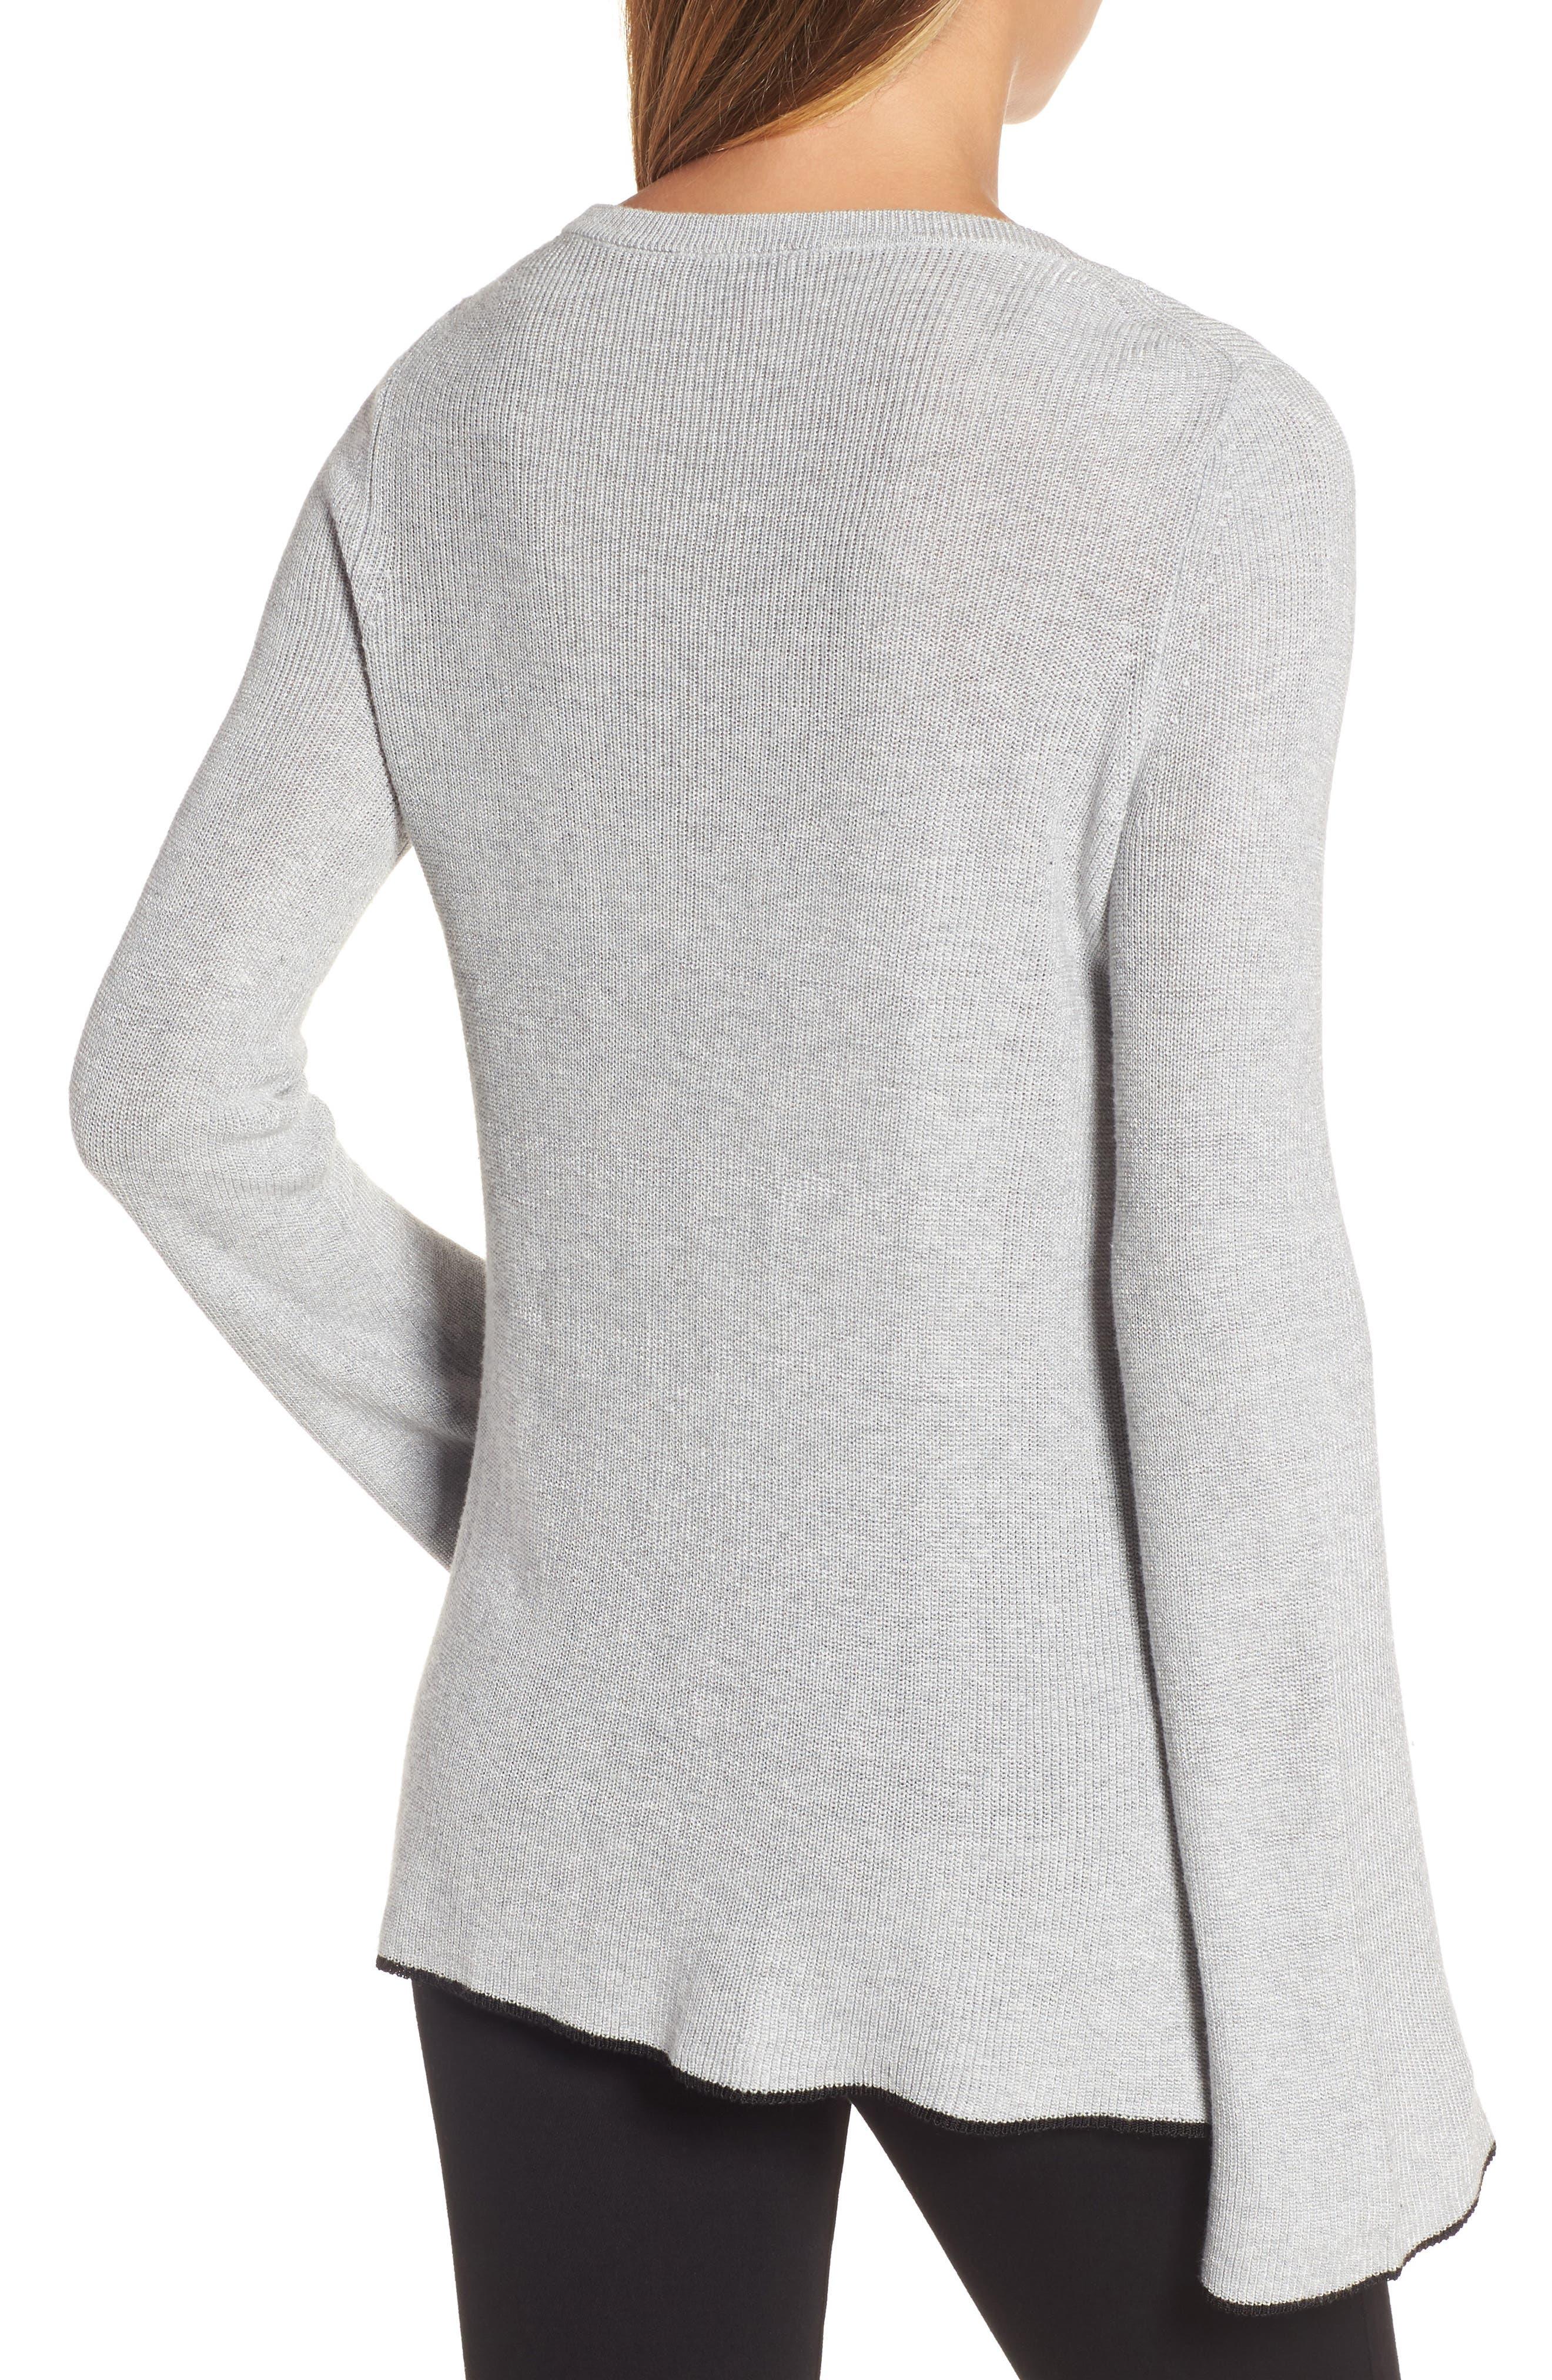 Alternate Image 2  - Vince Camuto Tipped Bell Sleeve Sweater (Regular & Petite)